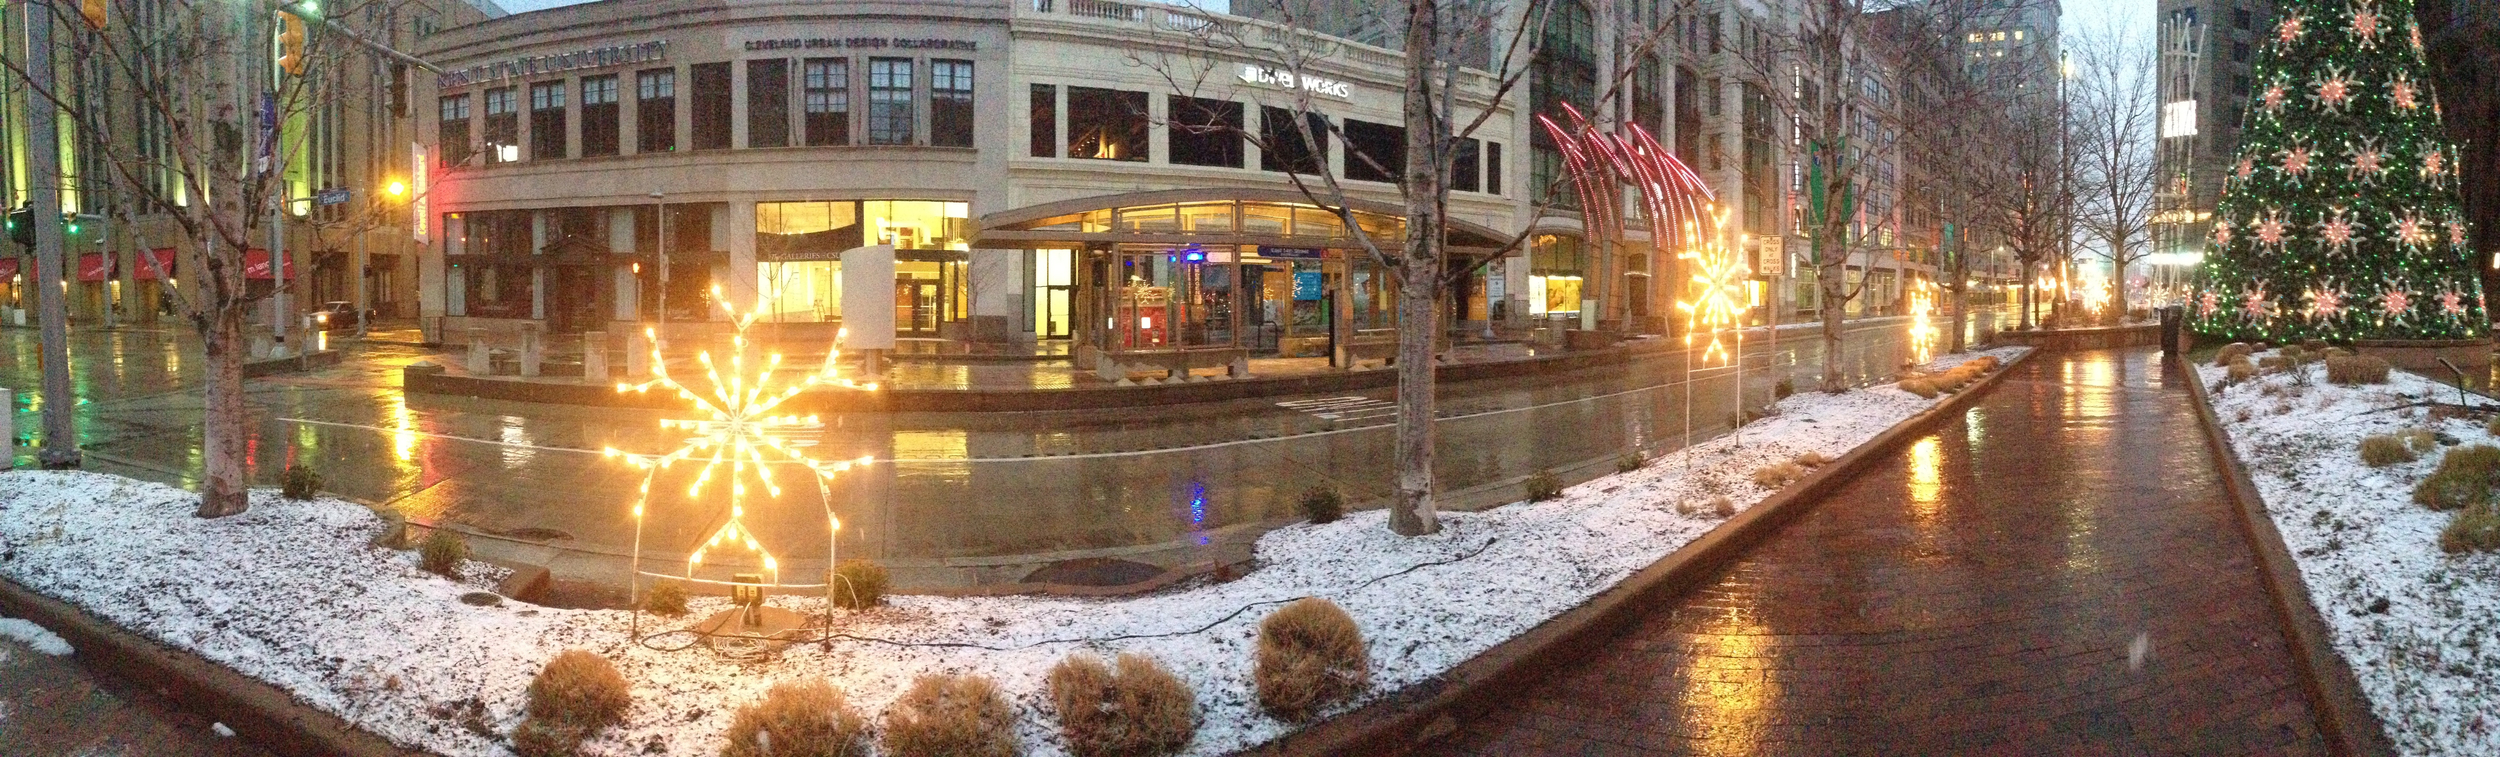 Snow Cleveland, OH.jpg